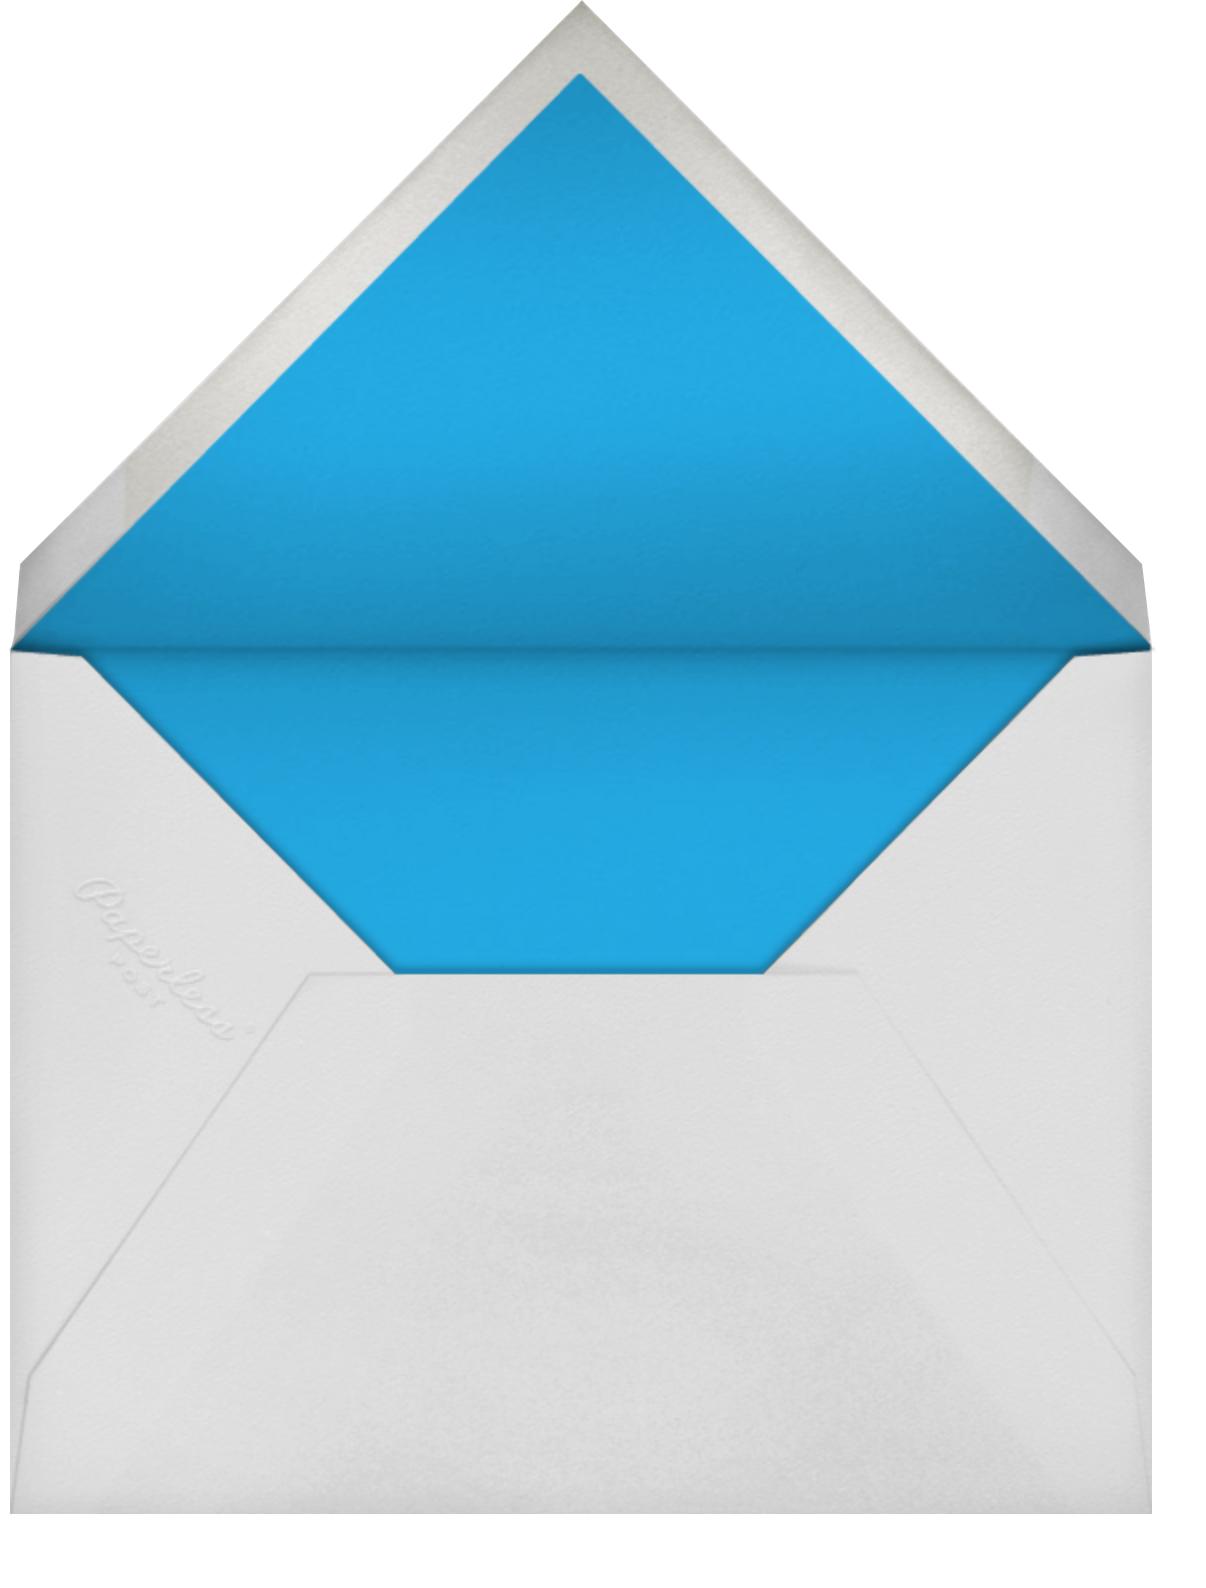 Rainbow Umbrellas - Gray Malin - Adult birthday - envelope back